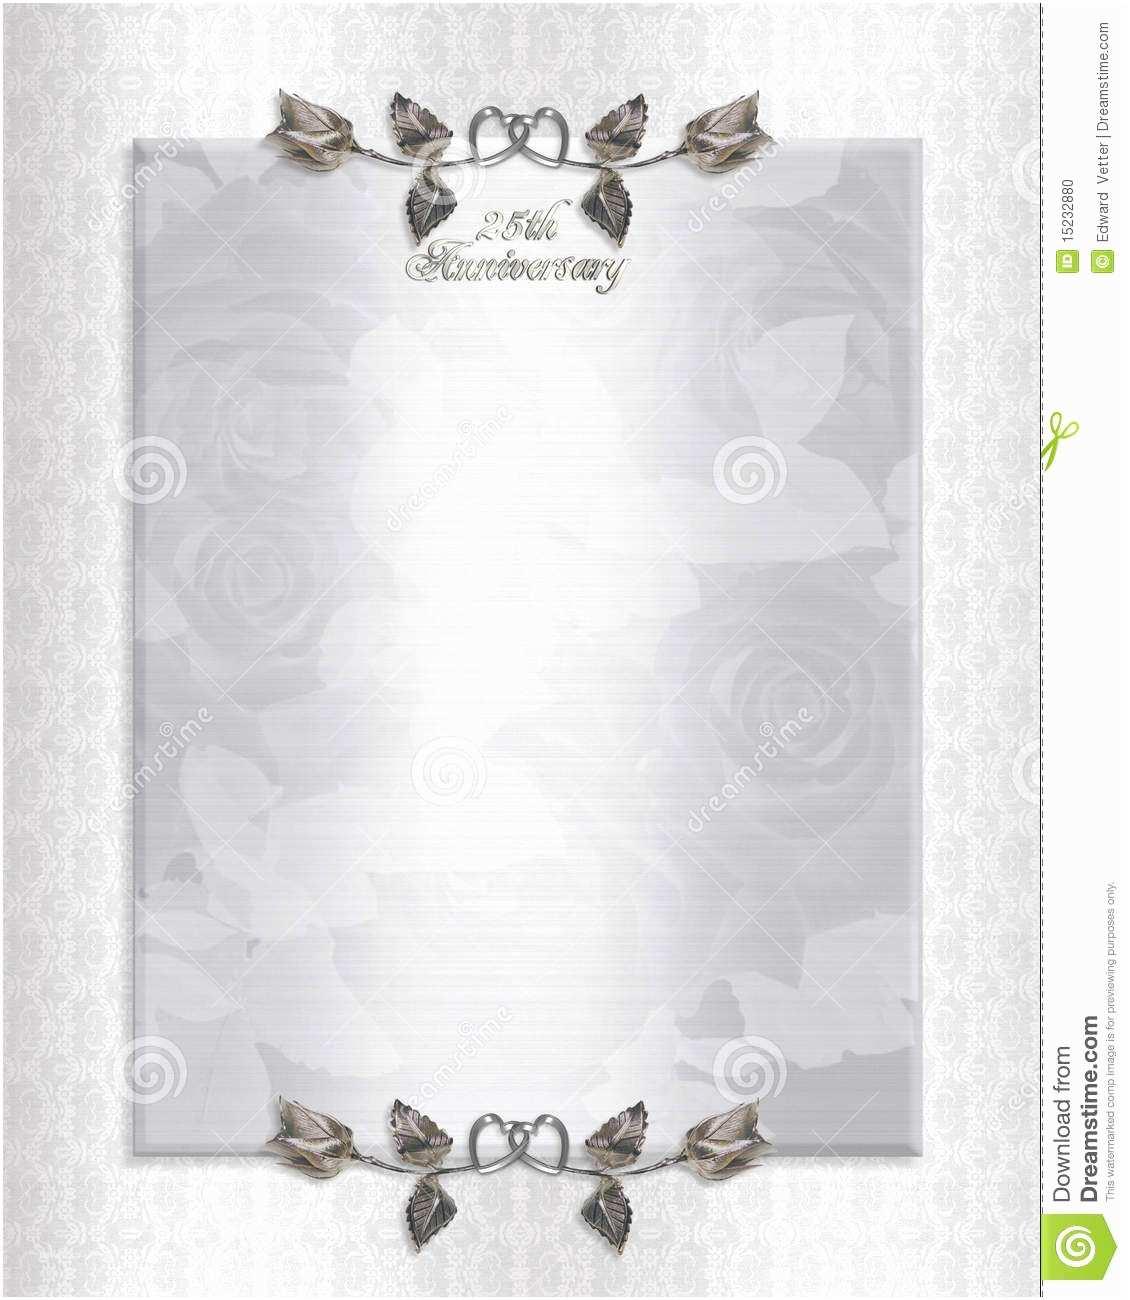 25th Wedding Anniversary Invitation Cards Free Download 25th Anniversary Invitation Templates Free